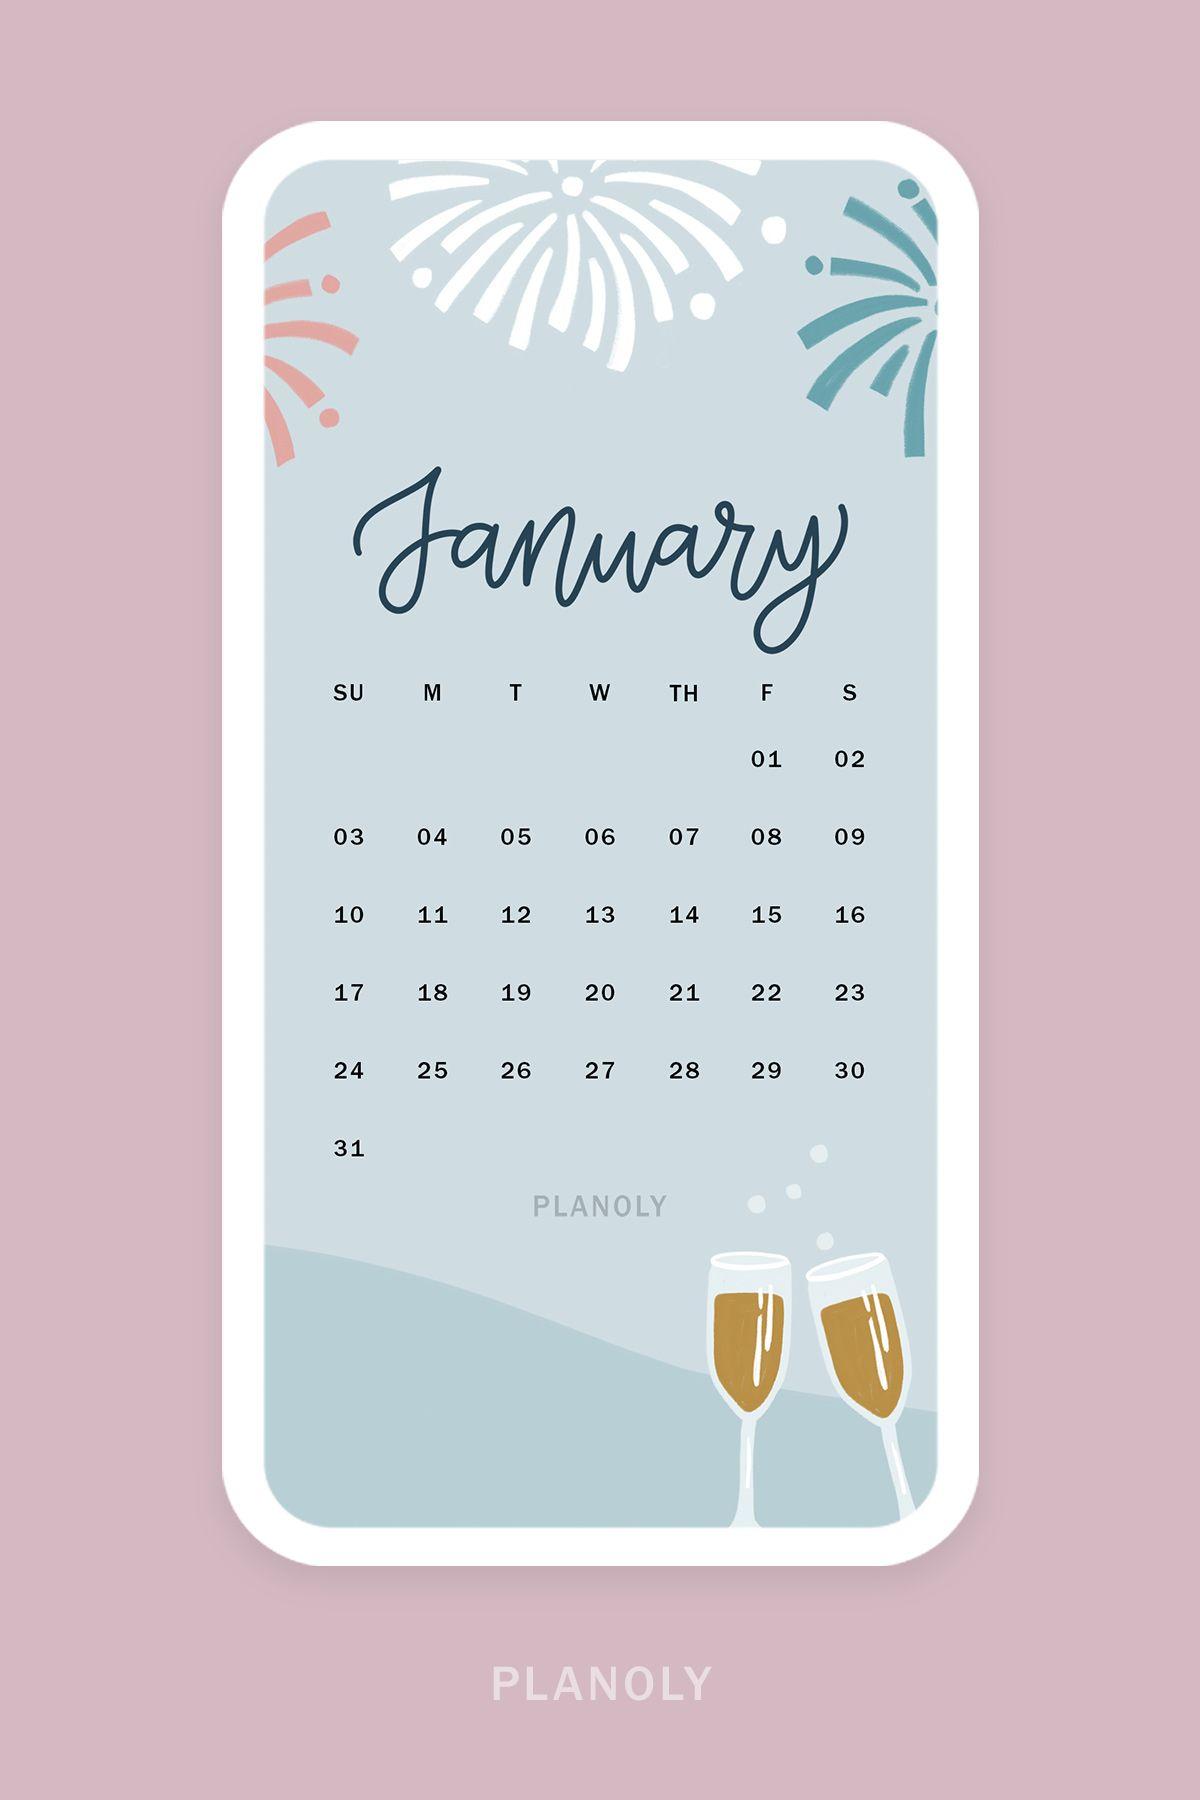 PLANOLY-Blog Post-Q1 Content Calendars-Image 4